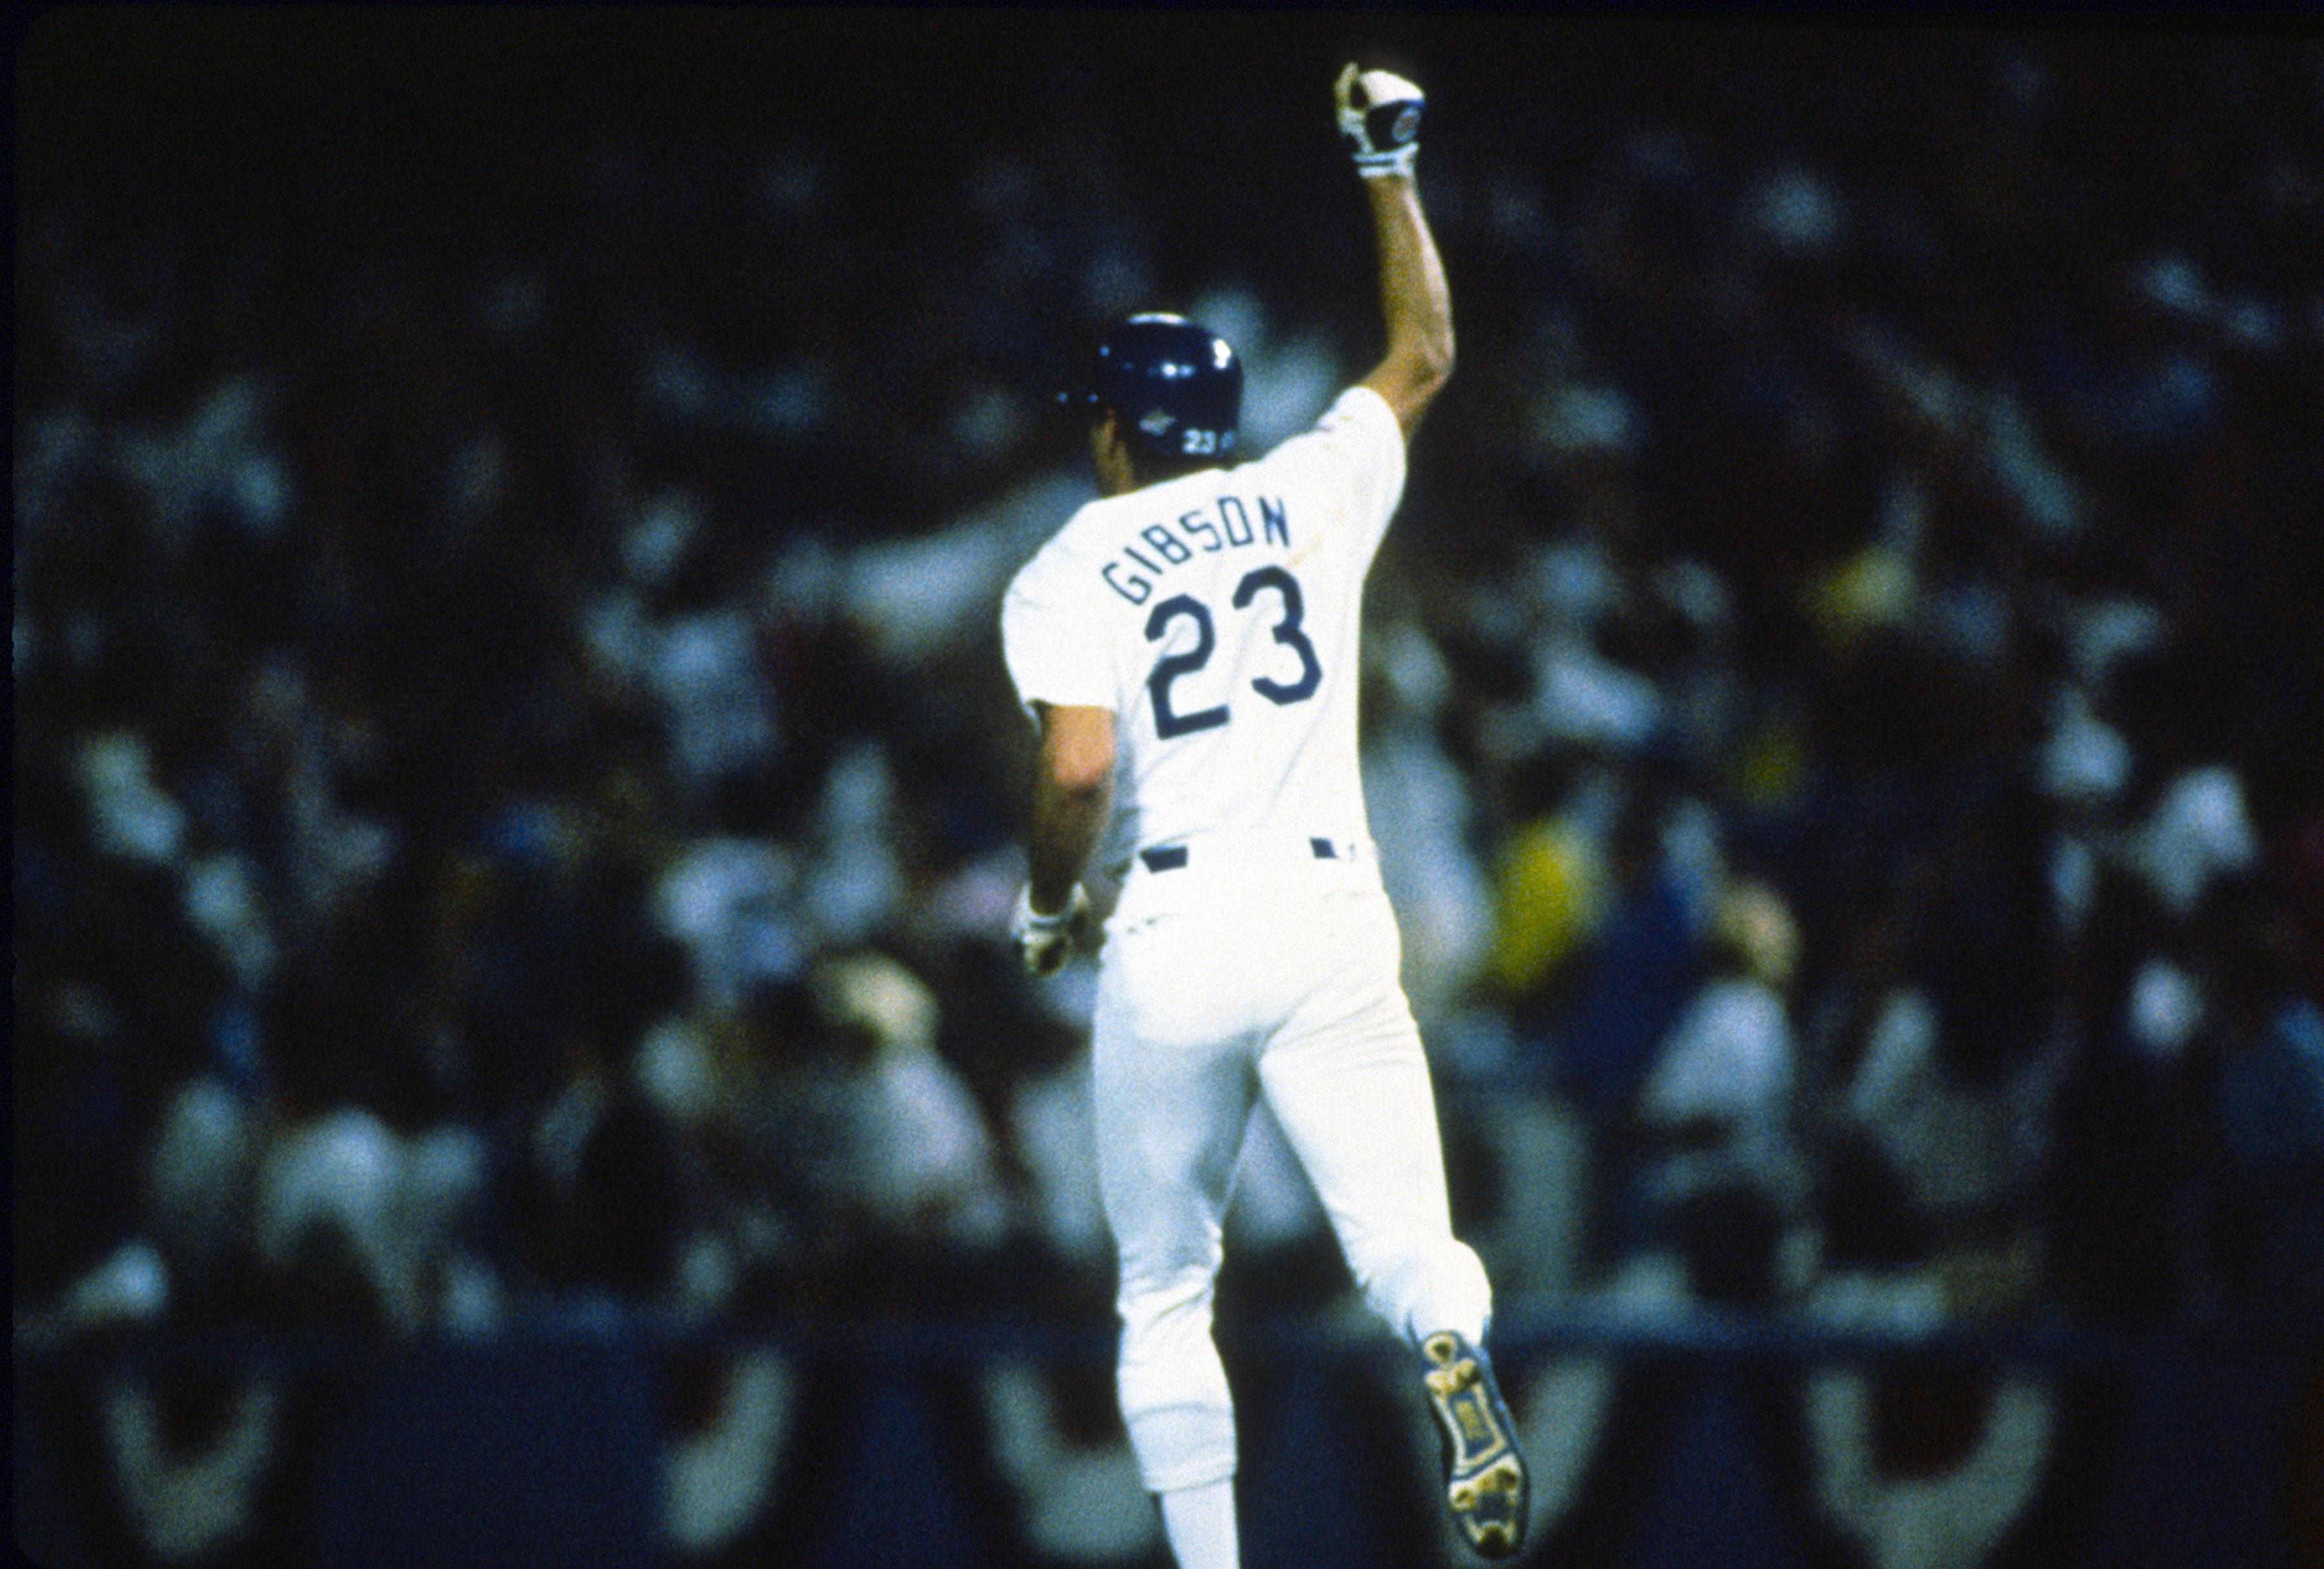 1988 World Series GM 1 - Oakland Athletics v Los Angeles Dodgers